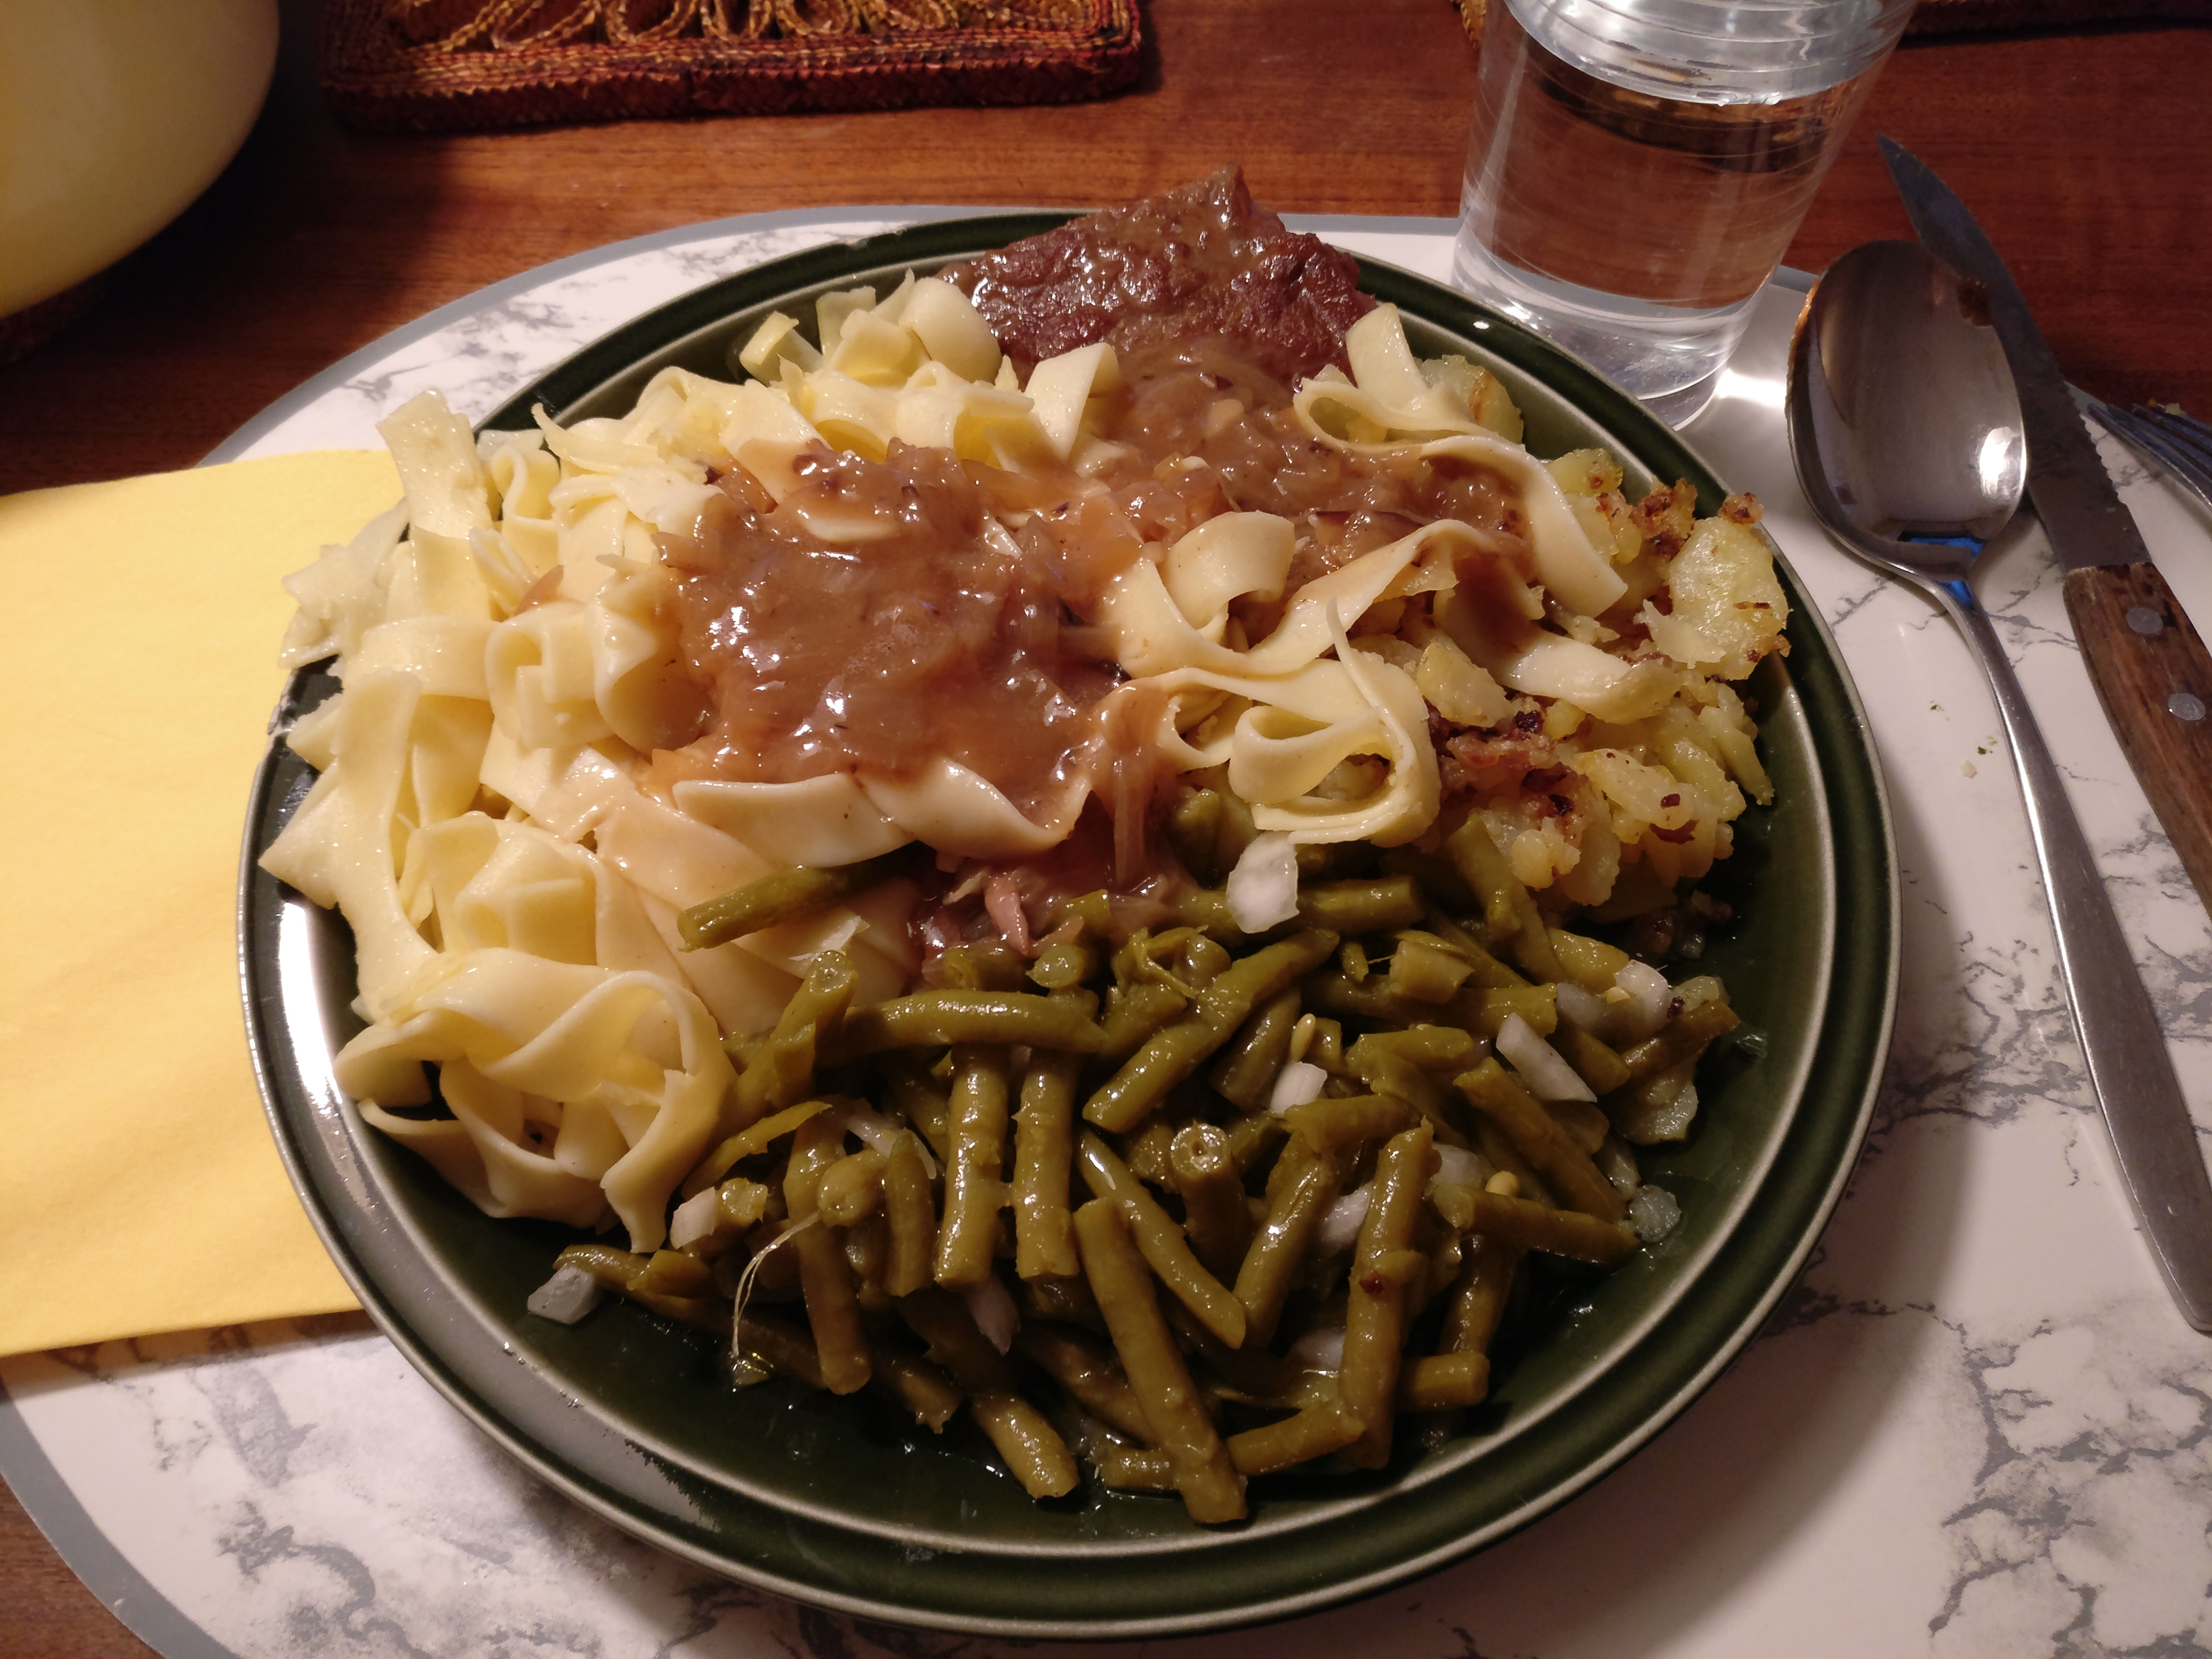 http://foodloader.net/nico_2017-05-31_zwiebelrostbraten-nudeln-bratkartoffeln-bohnensalat.jpg